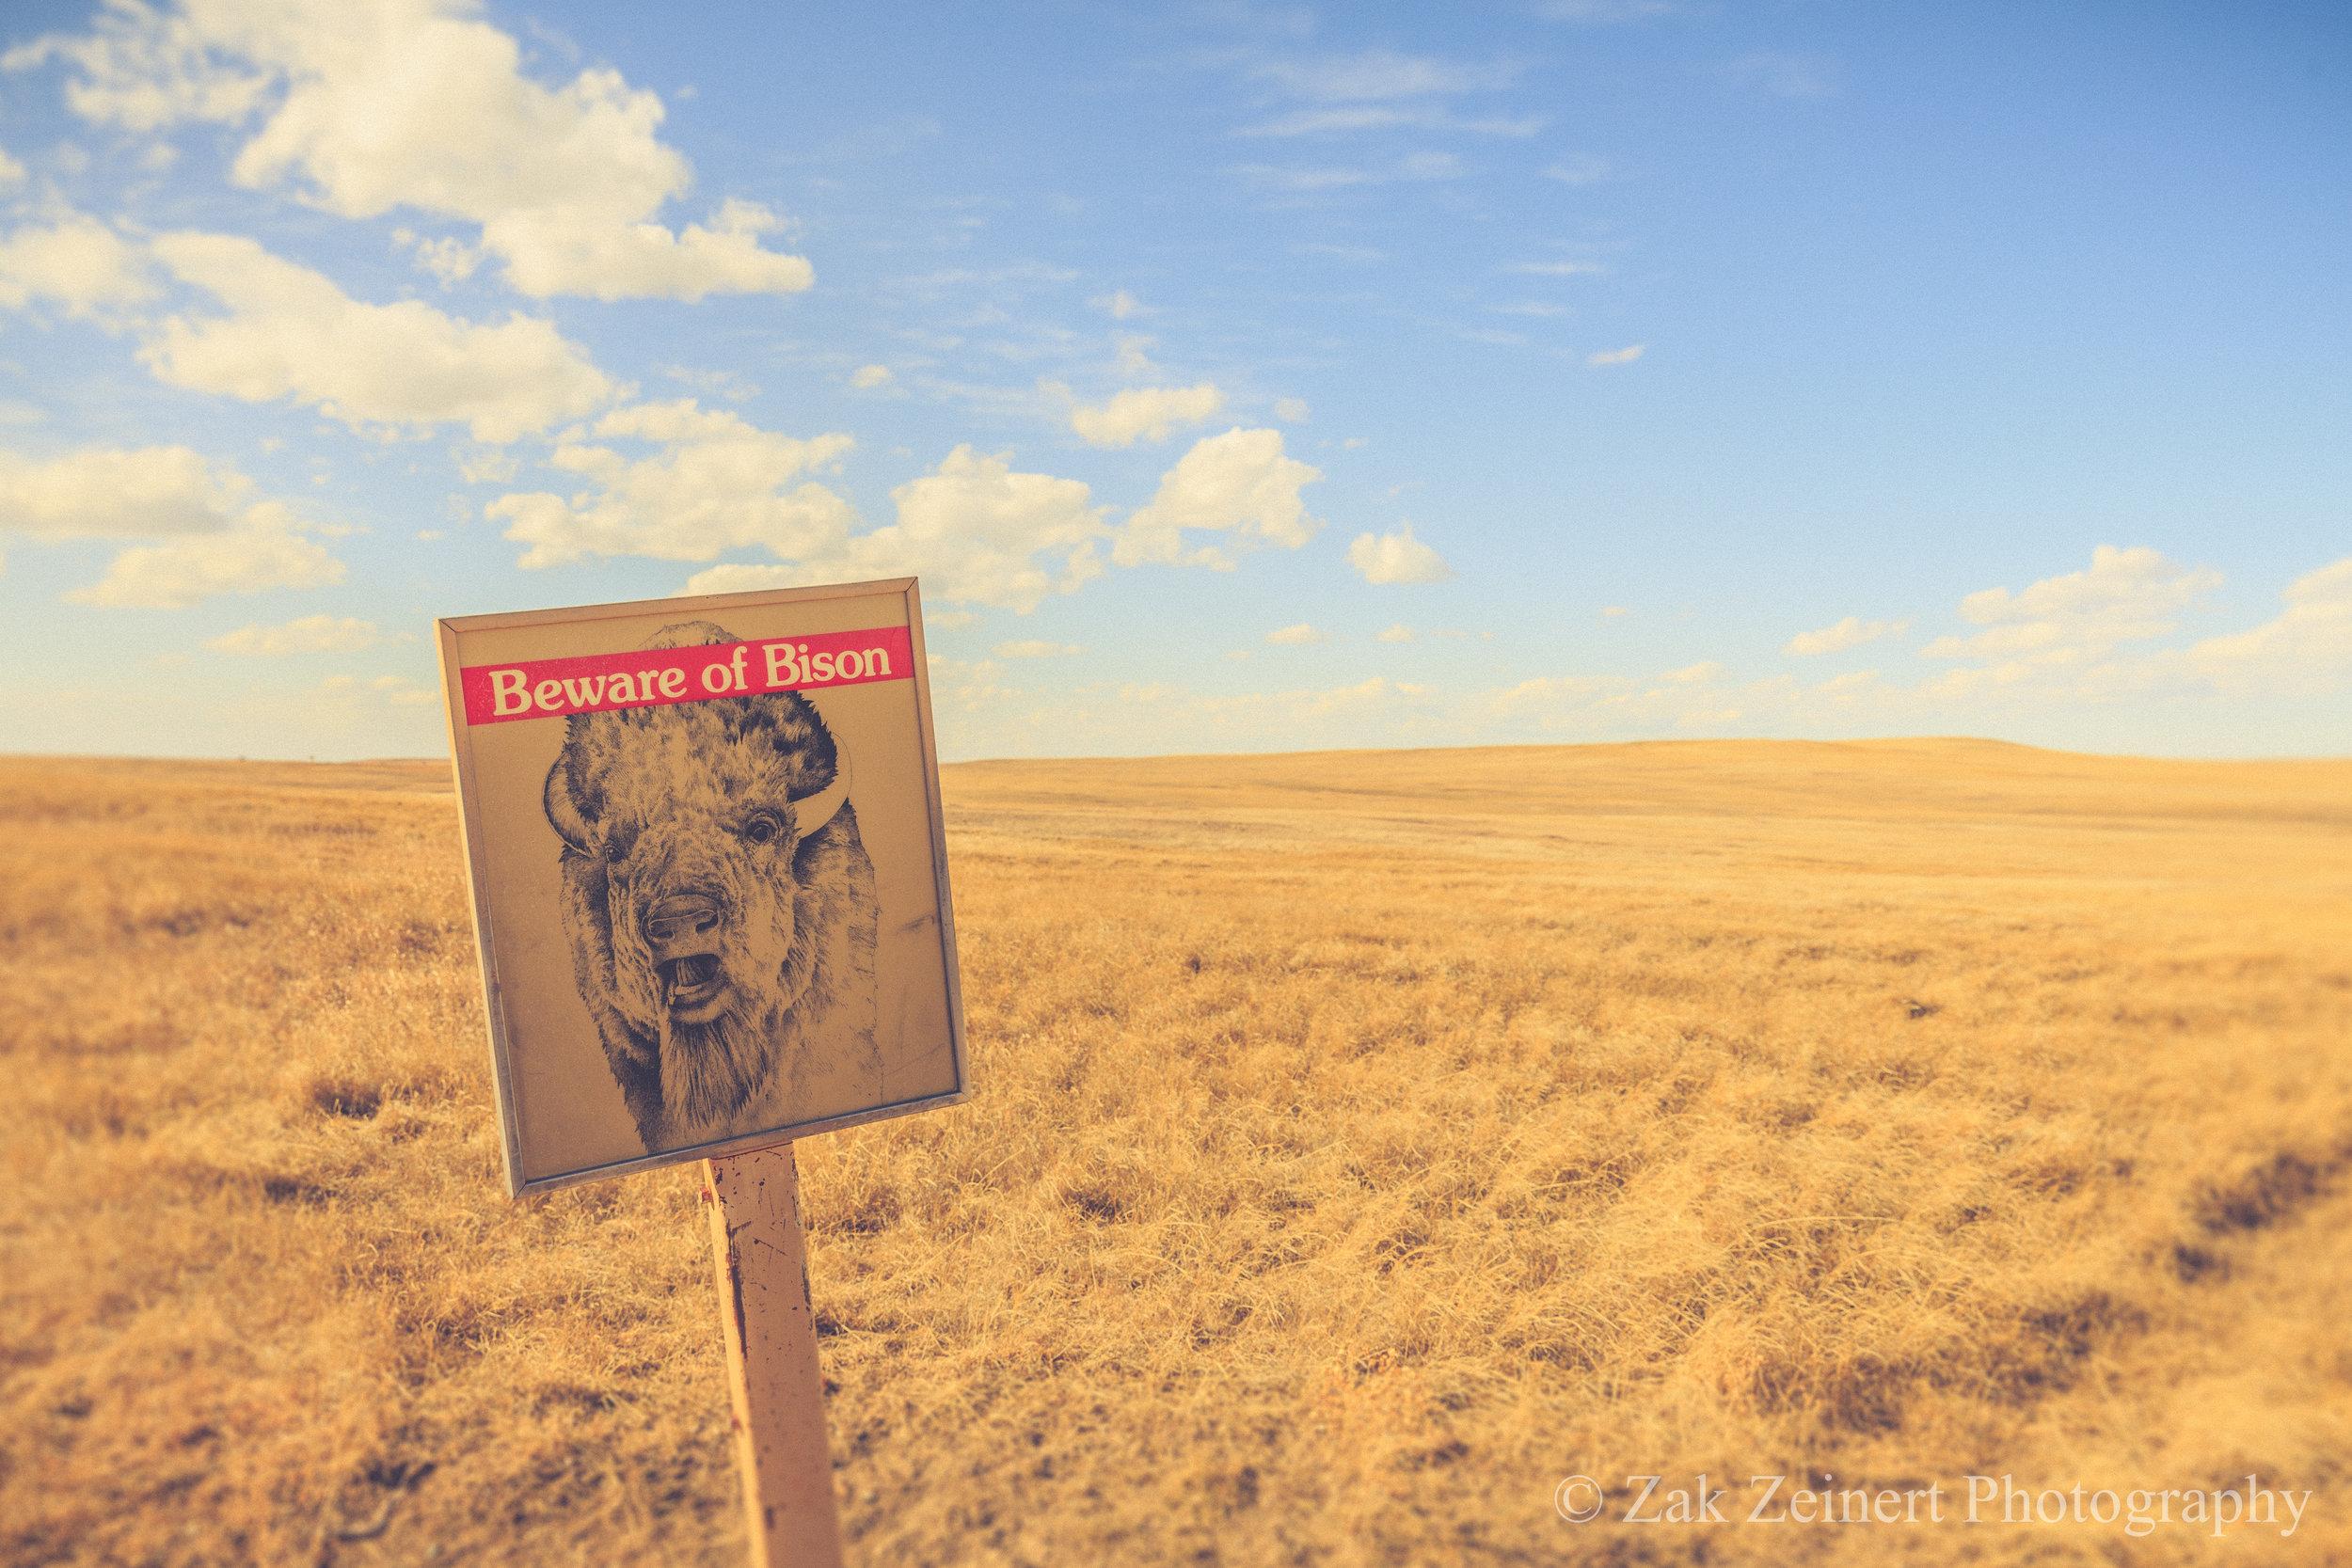 Ironically, compared to North Dakota, I barely saw any bison in South Dakota